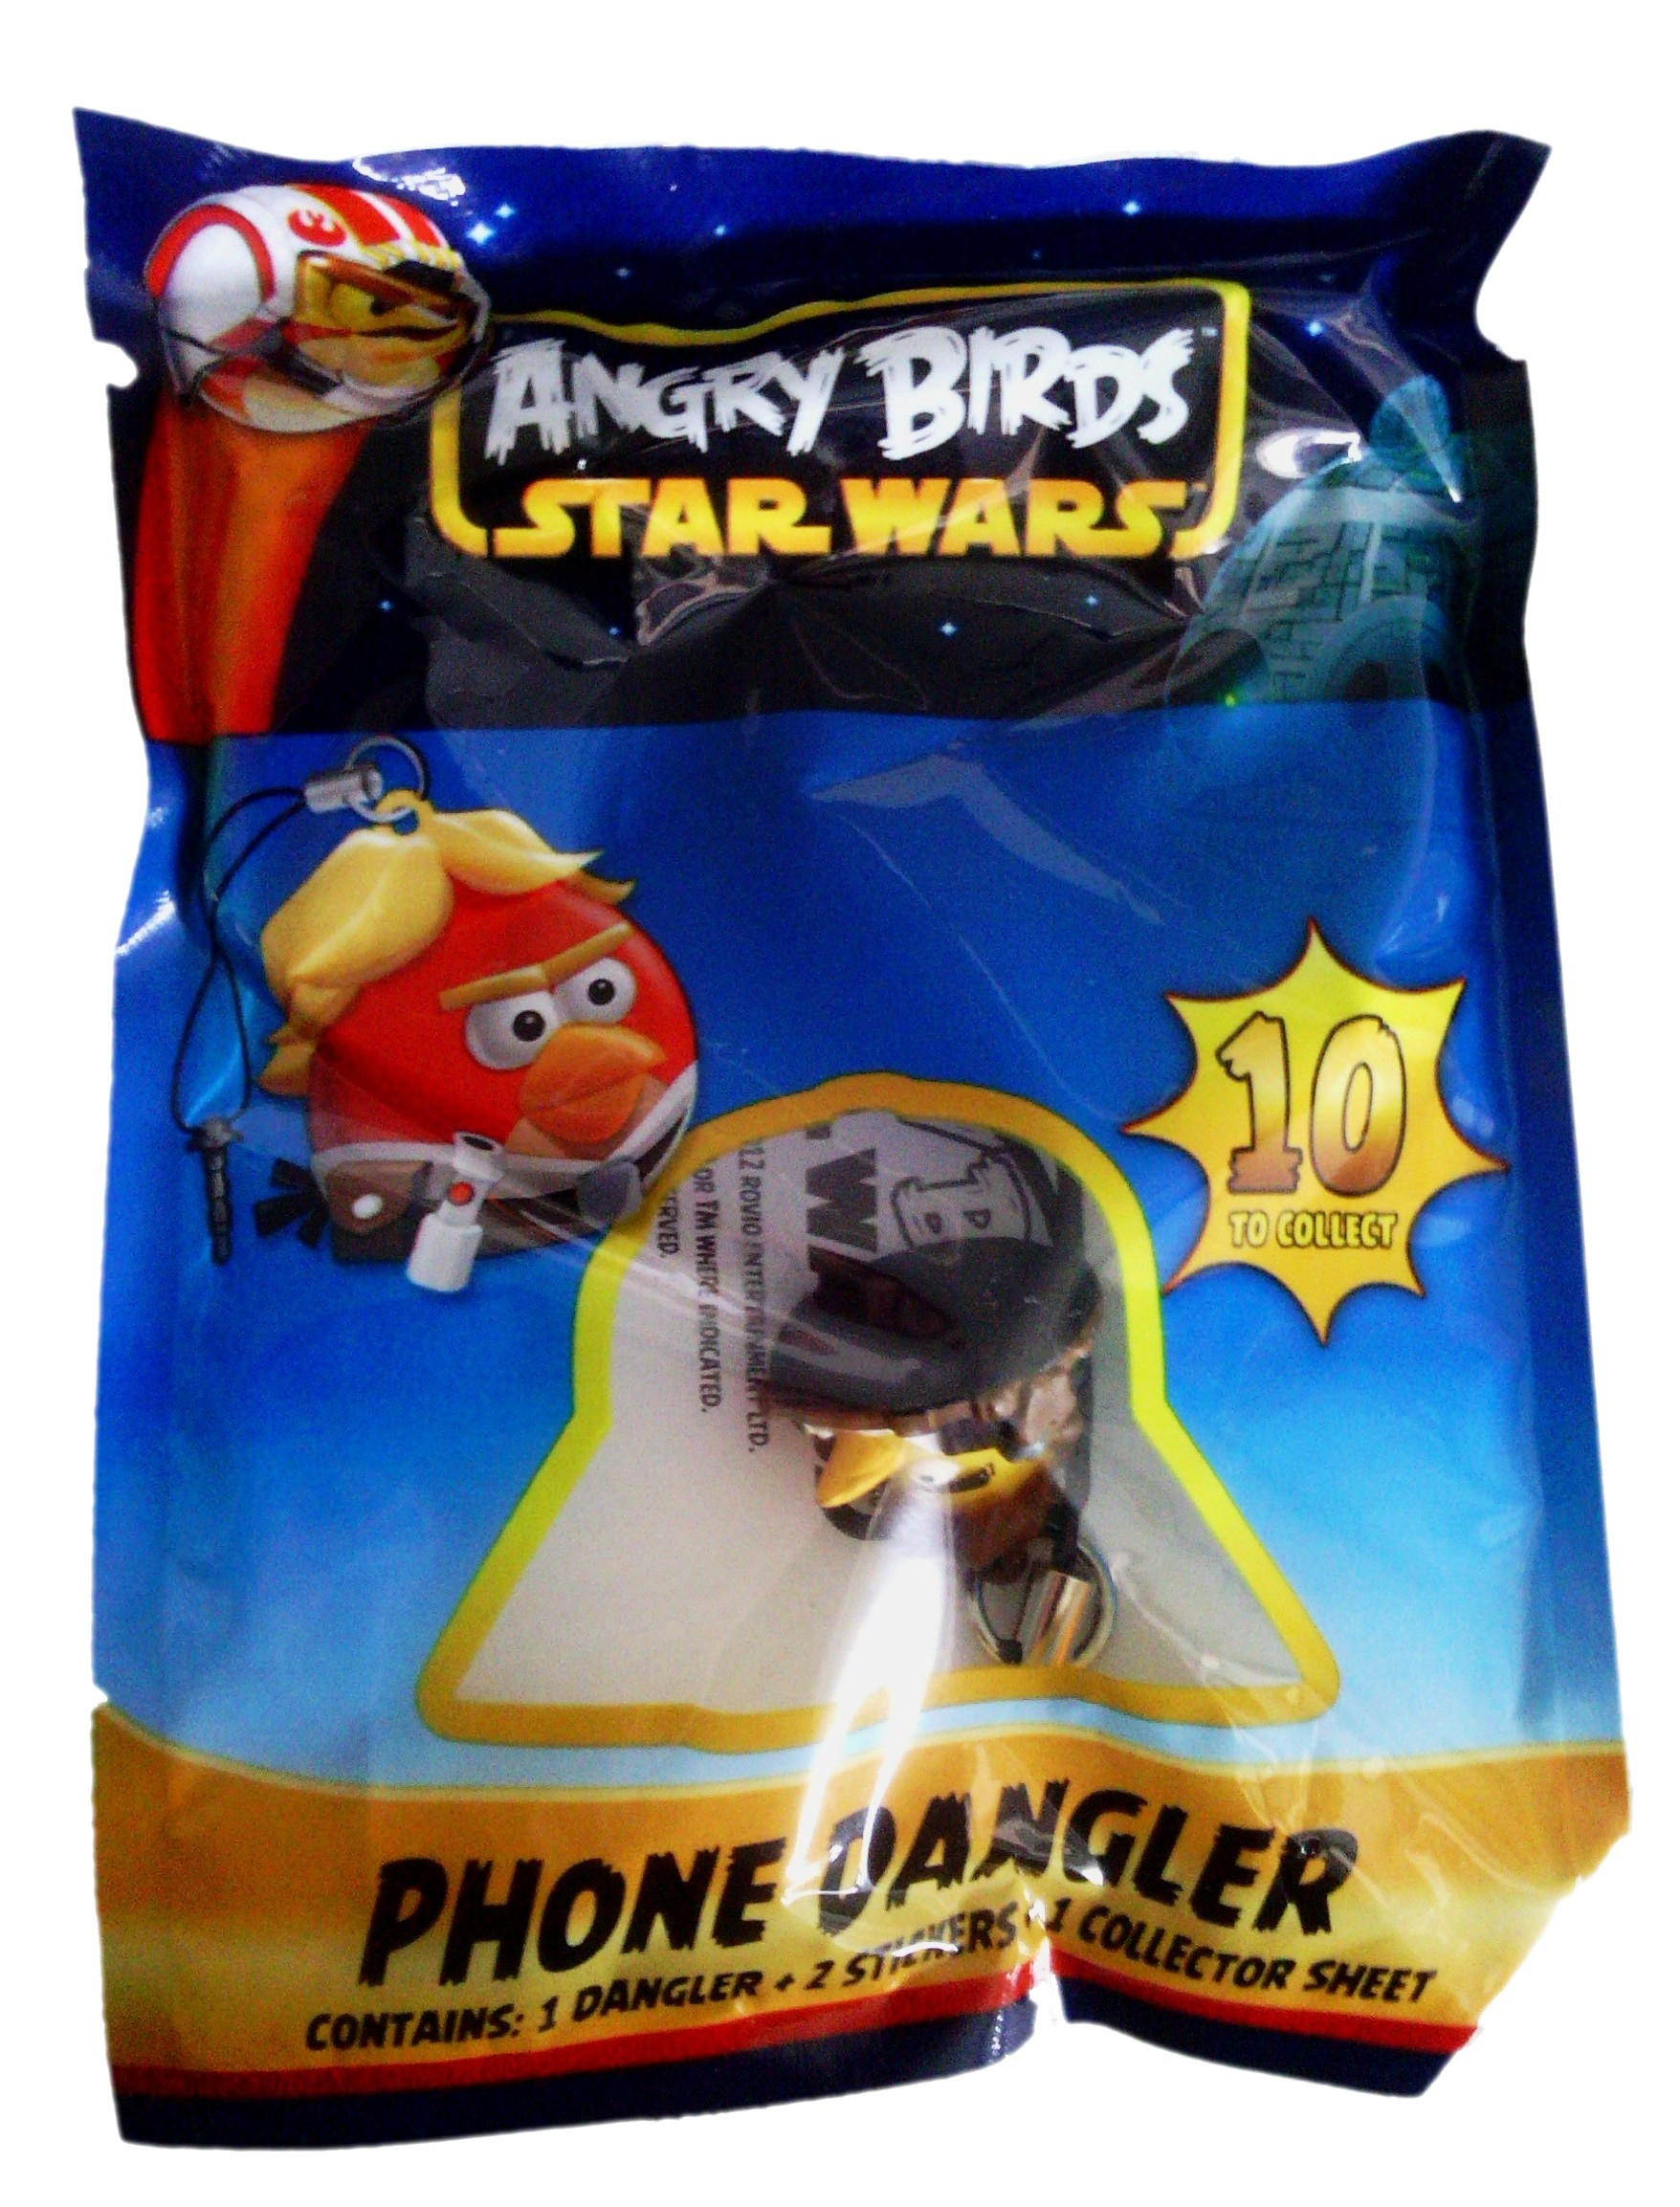 Angry Birds - Star Wars Dangler